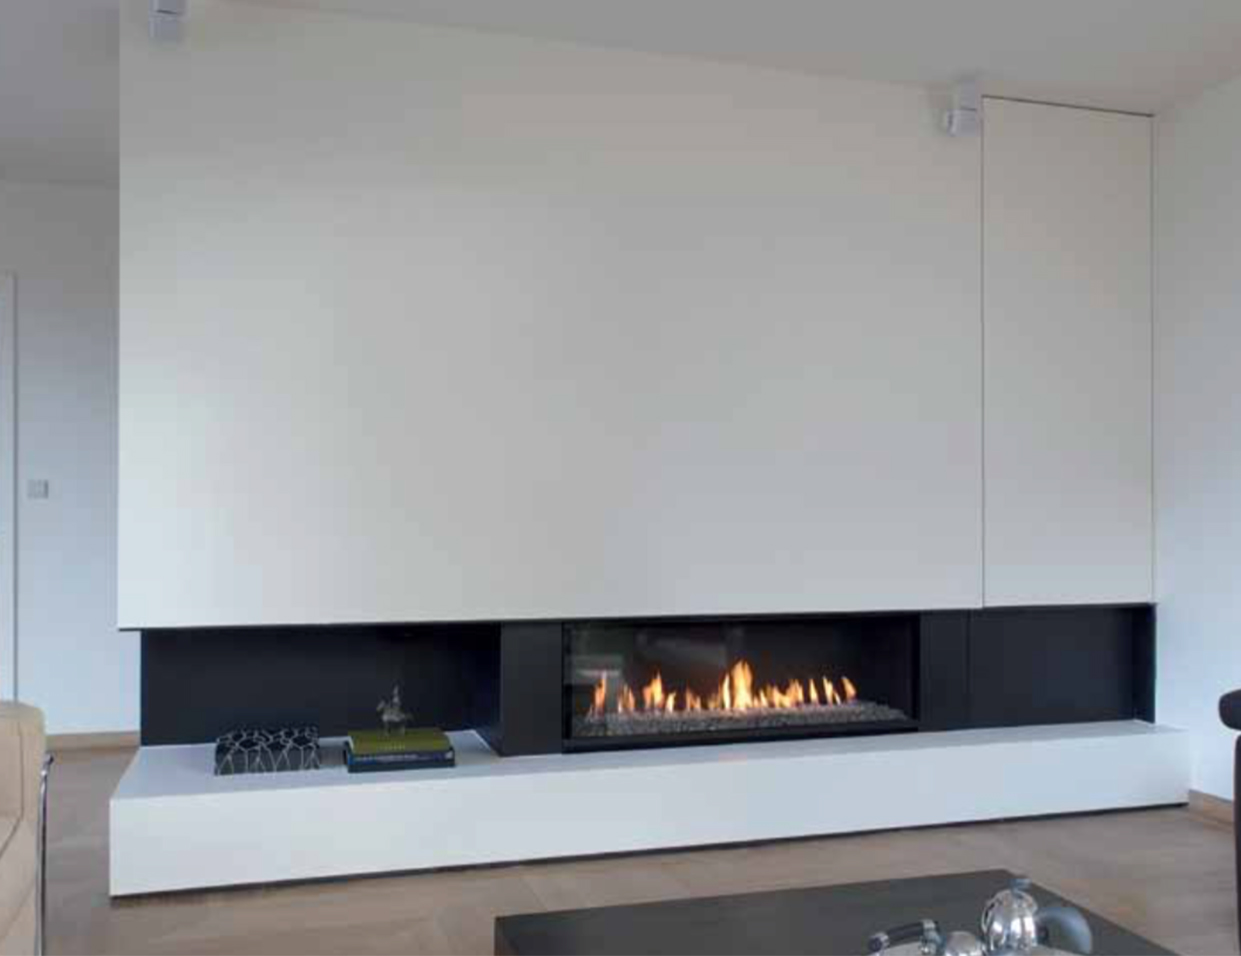 cheminee au gaz contemporaine ew79 montrealeast. Black Bedroom Furniture Sets. Home Design Ideas